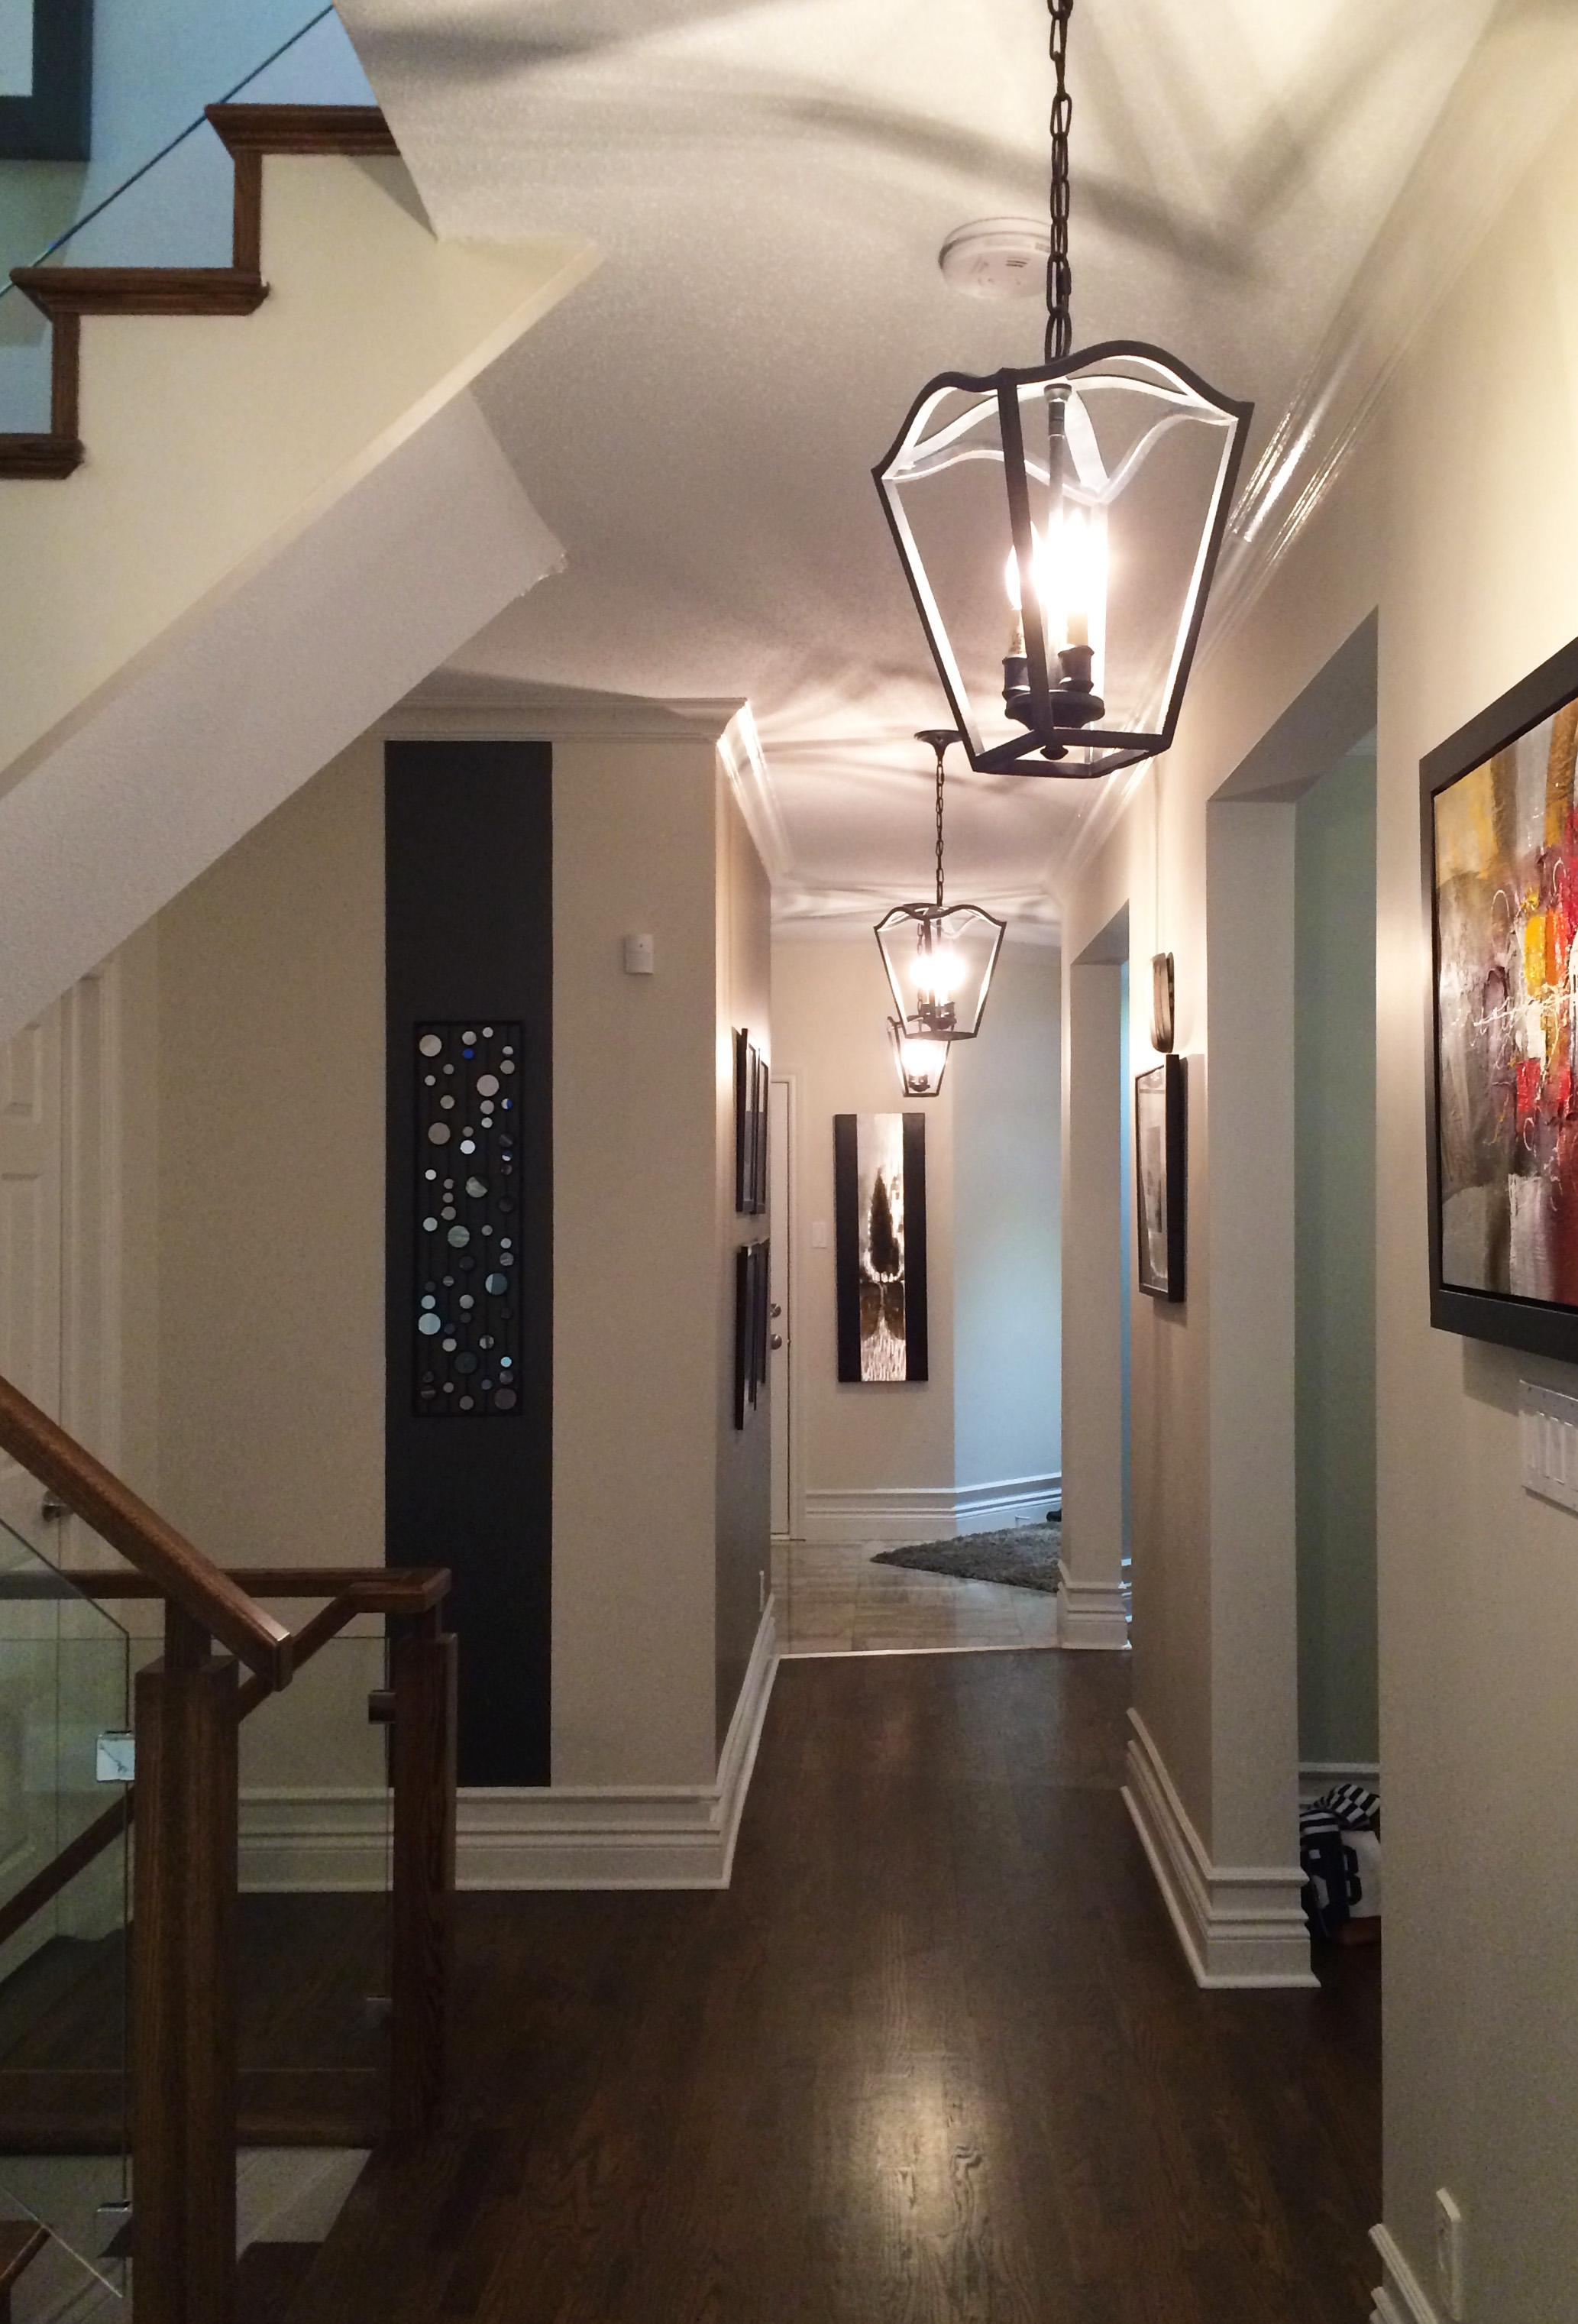 Residential Home Design - Hallway